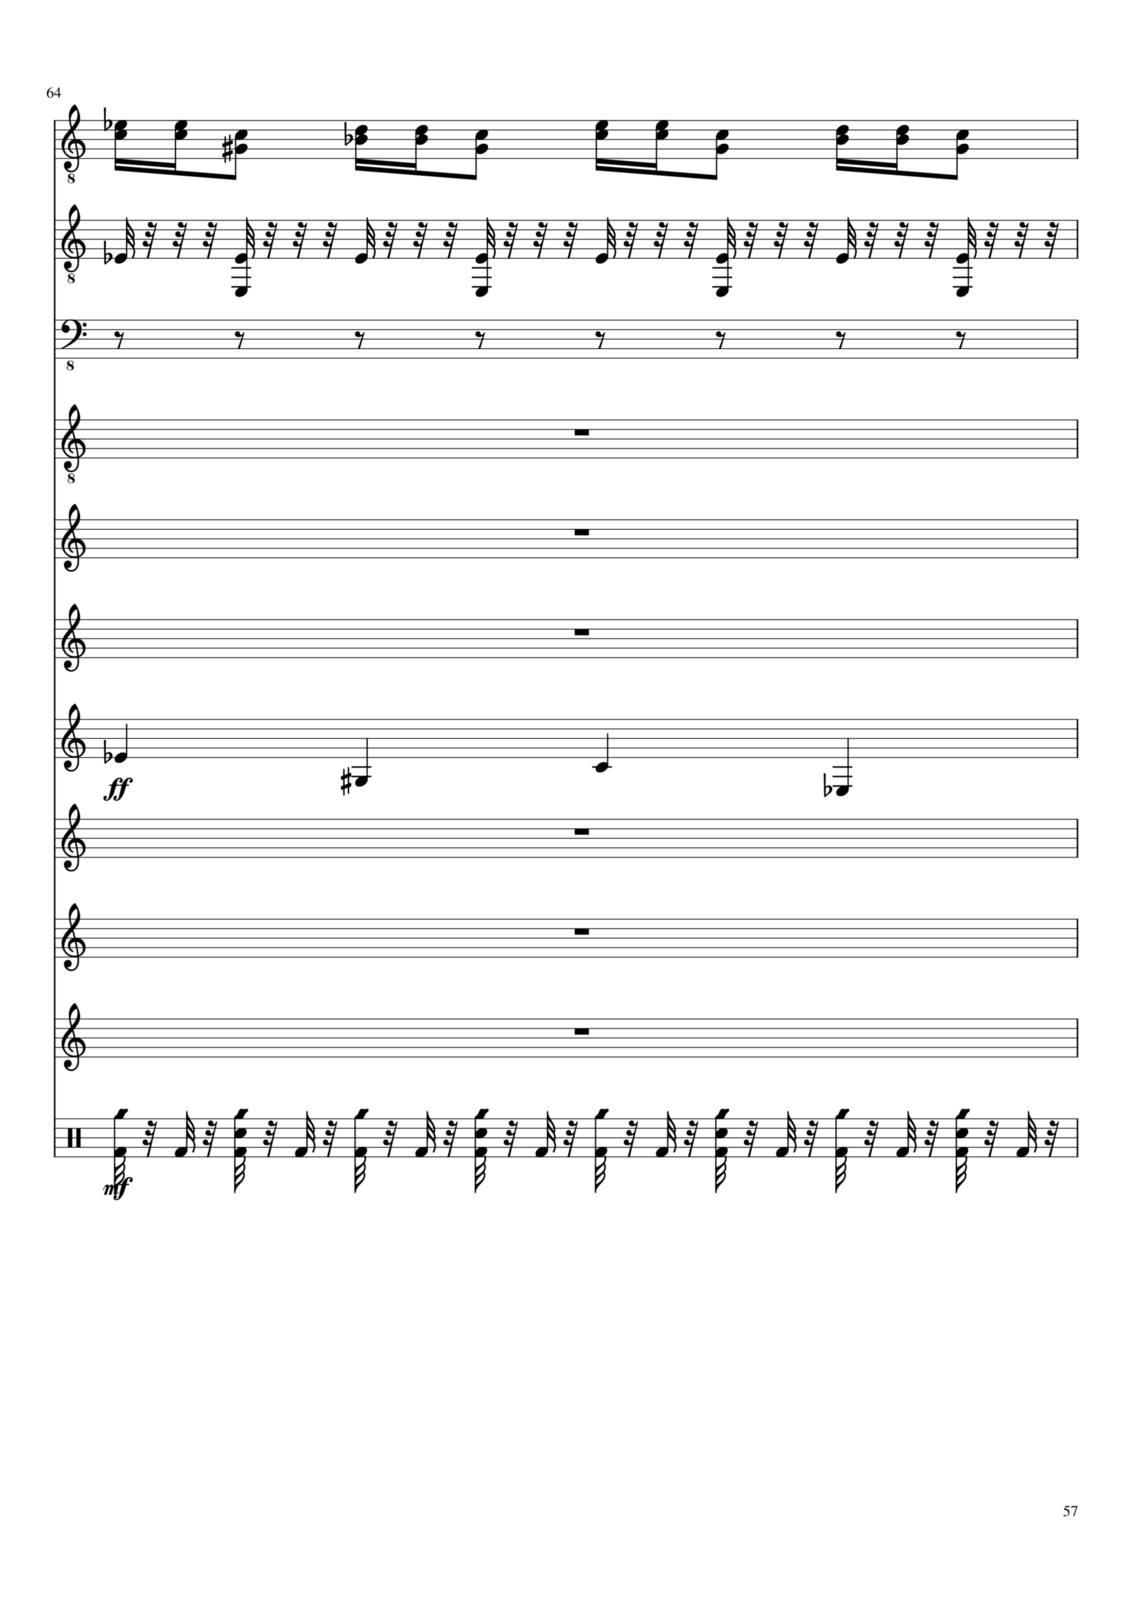 Belyiy sokol slide, Image 57